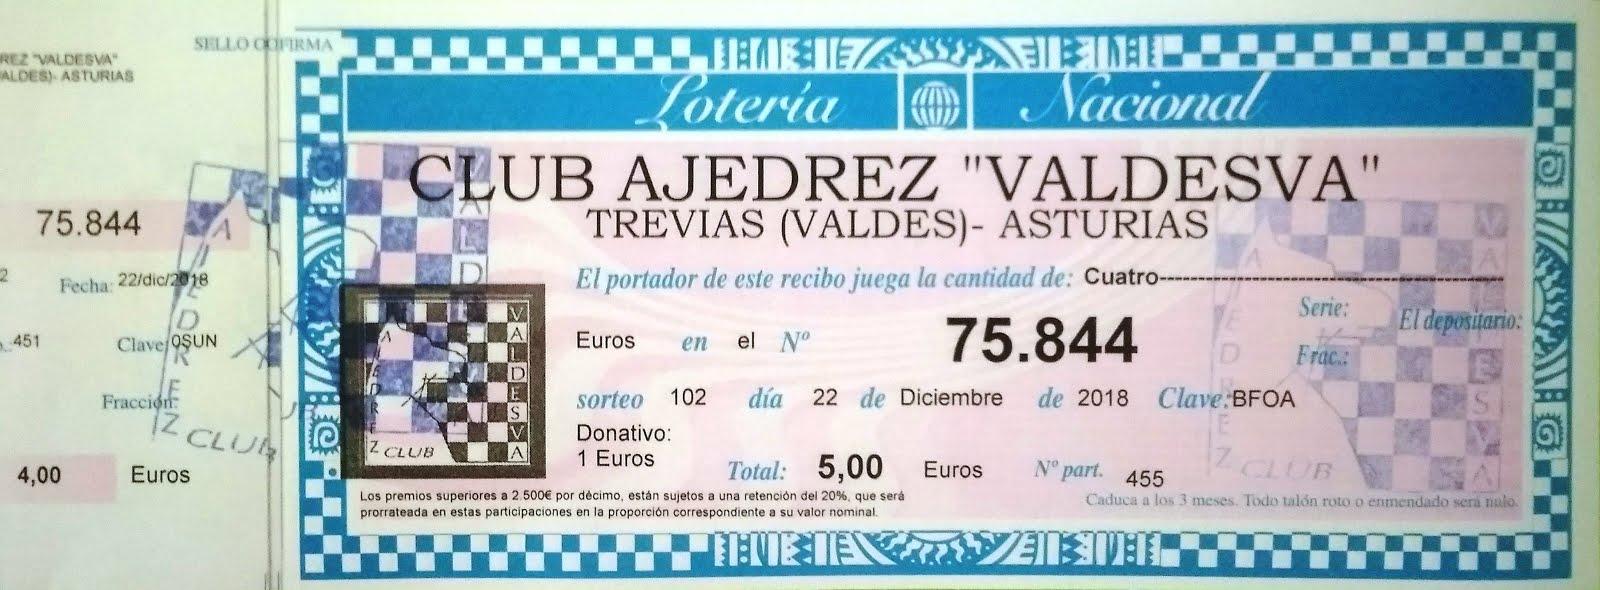 Lotería Valdesva 2018